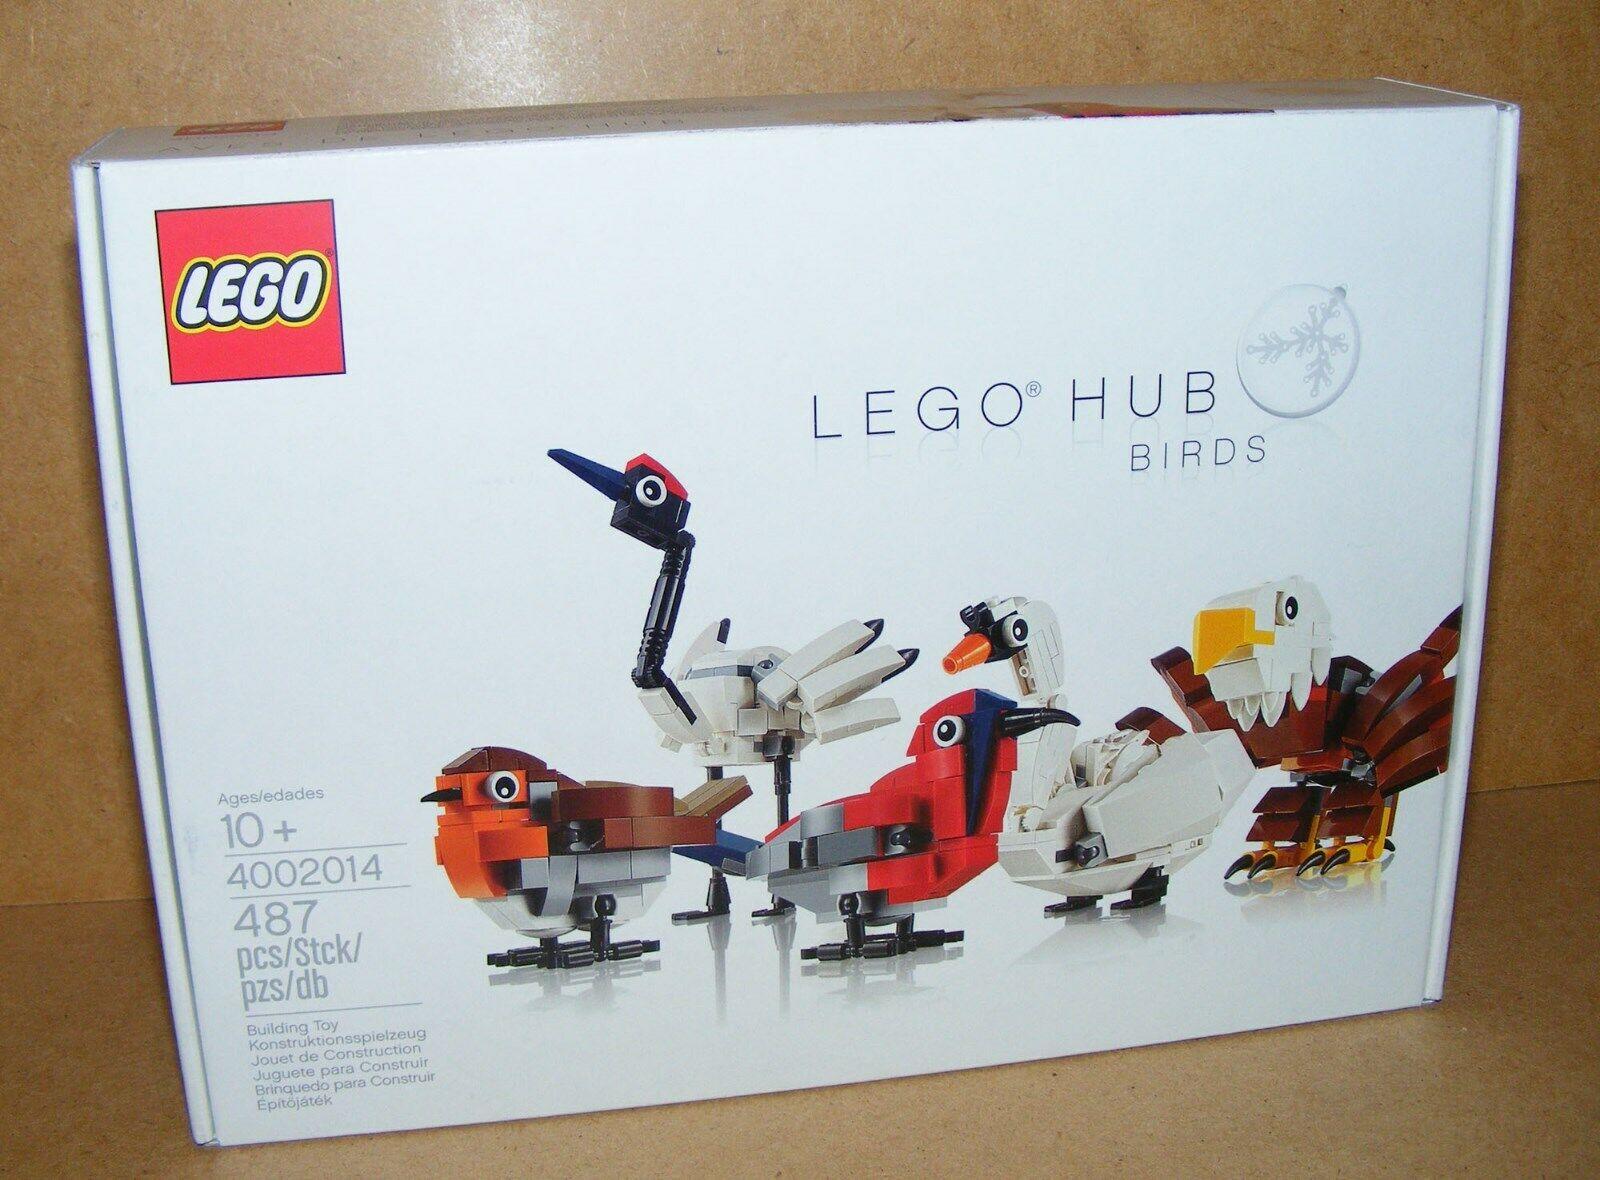 NEW LEGO 4002014 HUB BIRDS BIRD RARE EXLUSIVE 2014 NISB EMPLOYEE GIFT UNOPENED